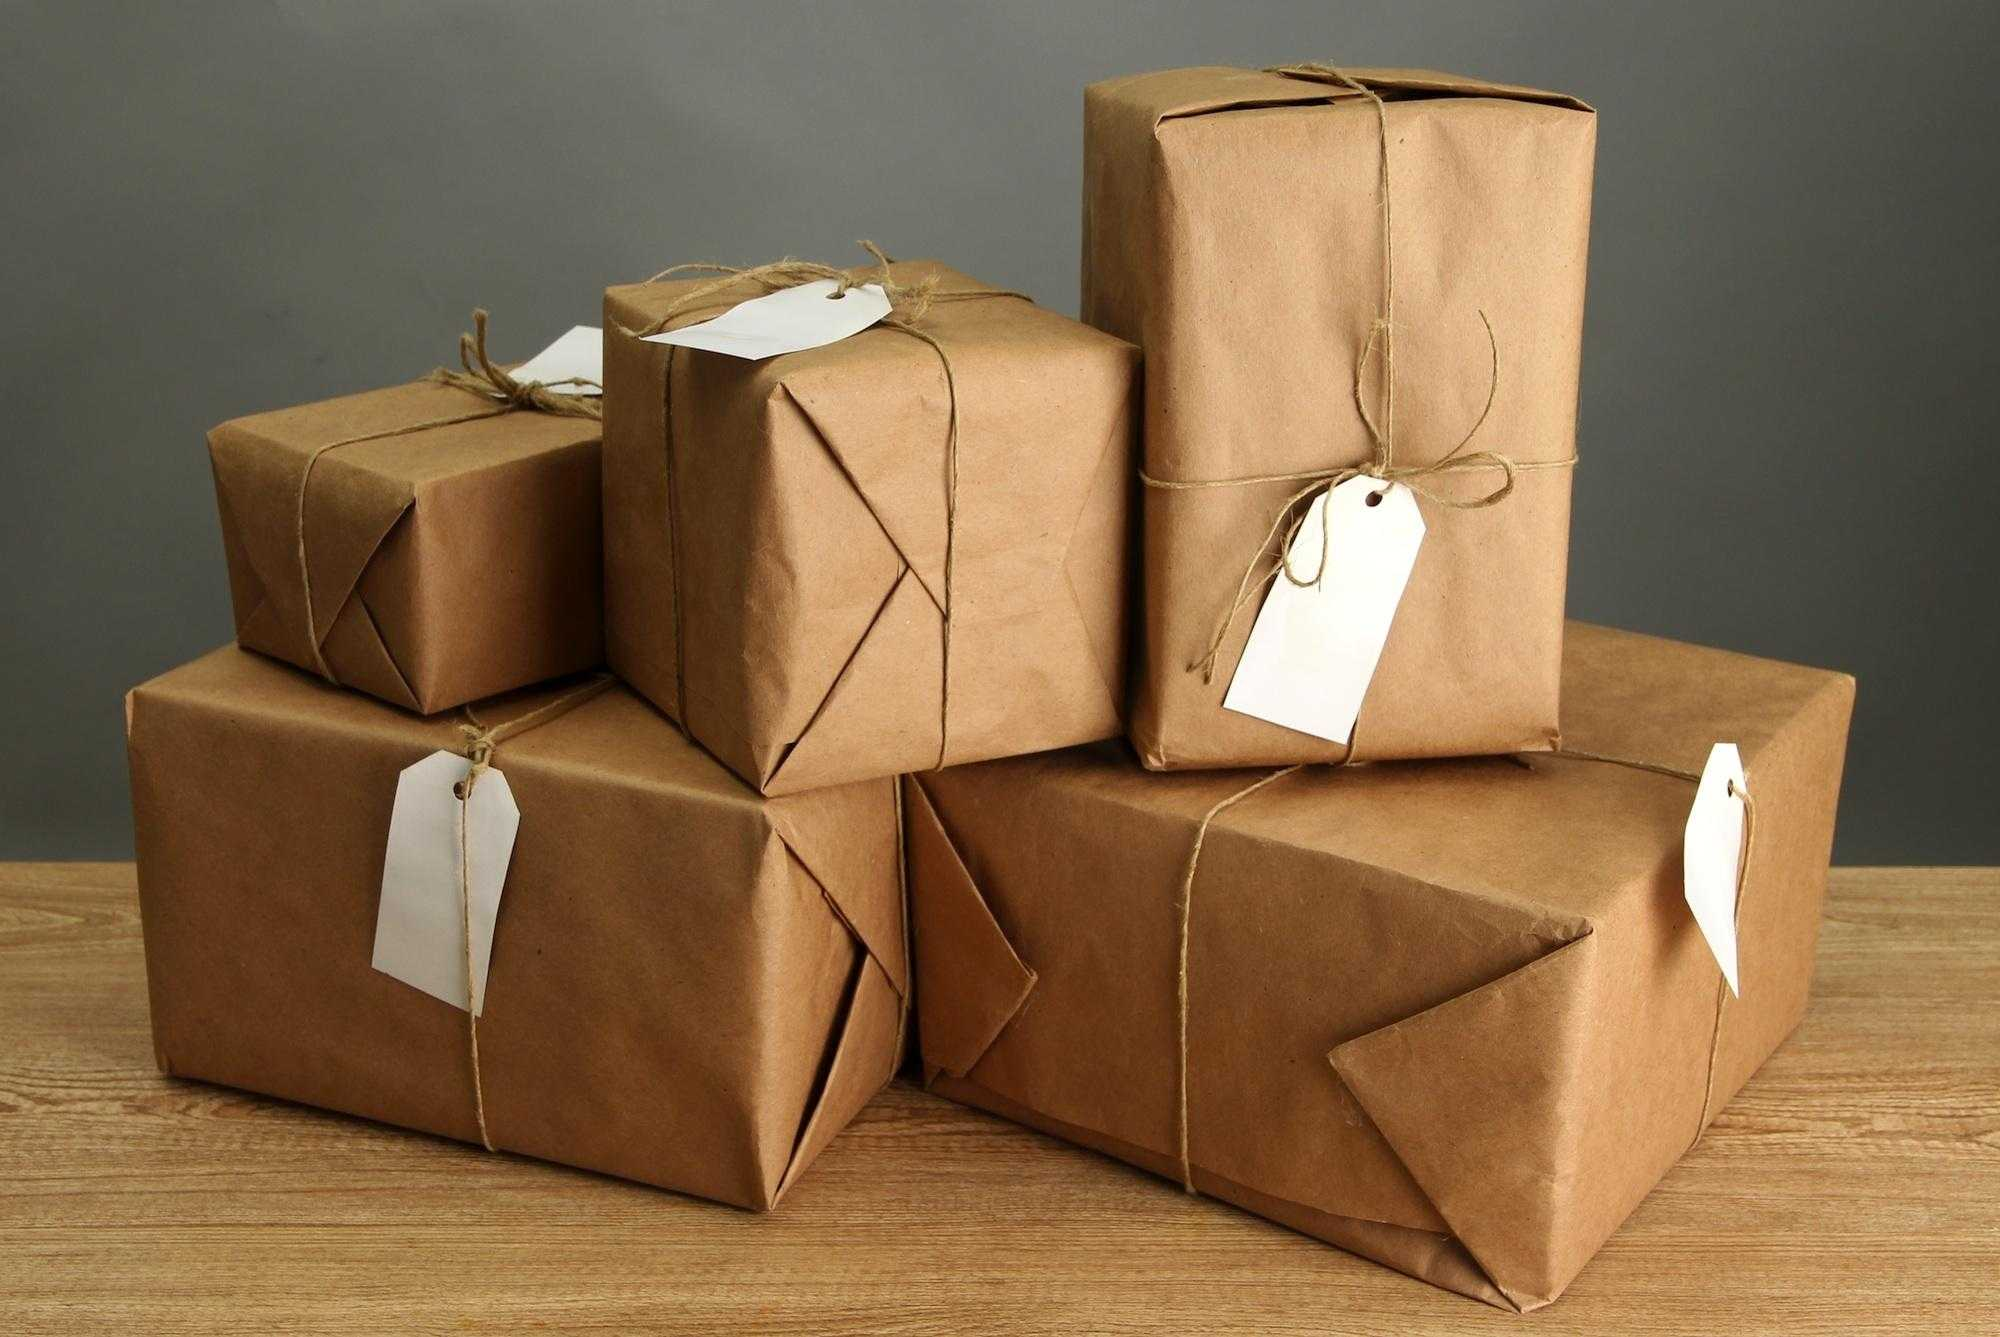 package-fedorafans.com